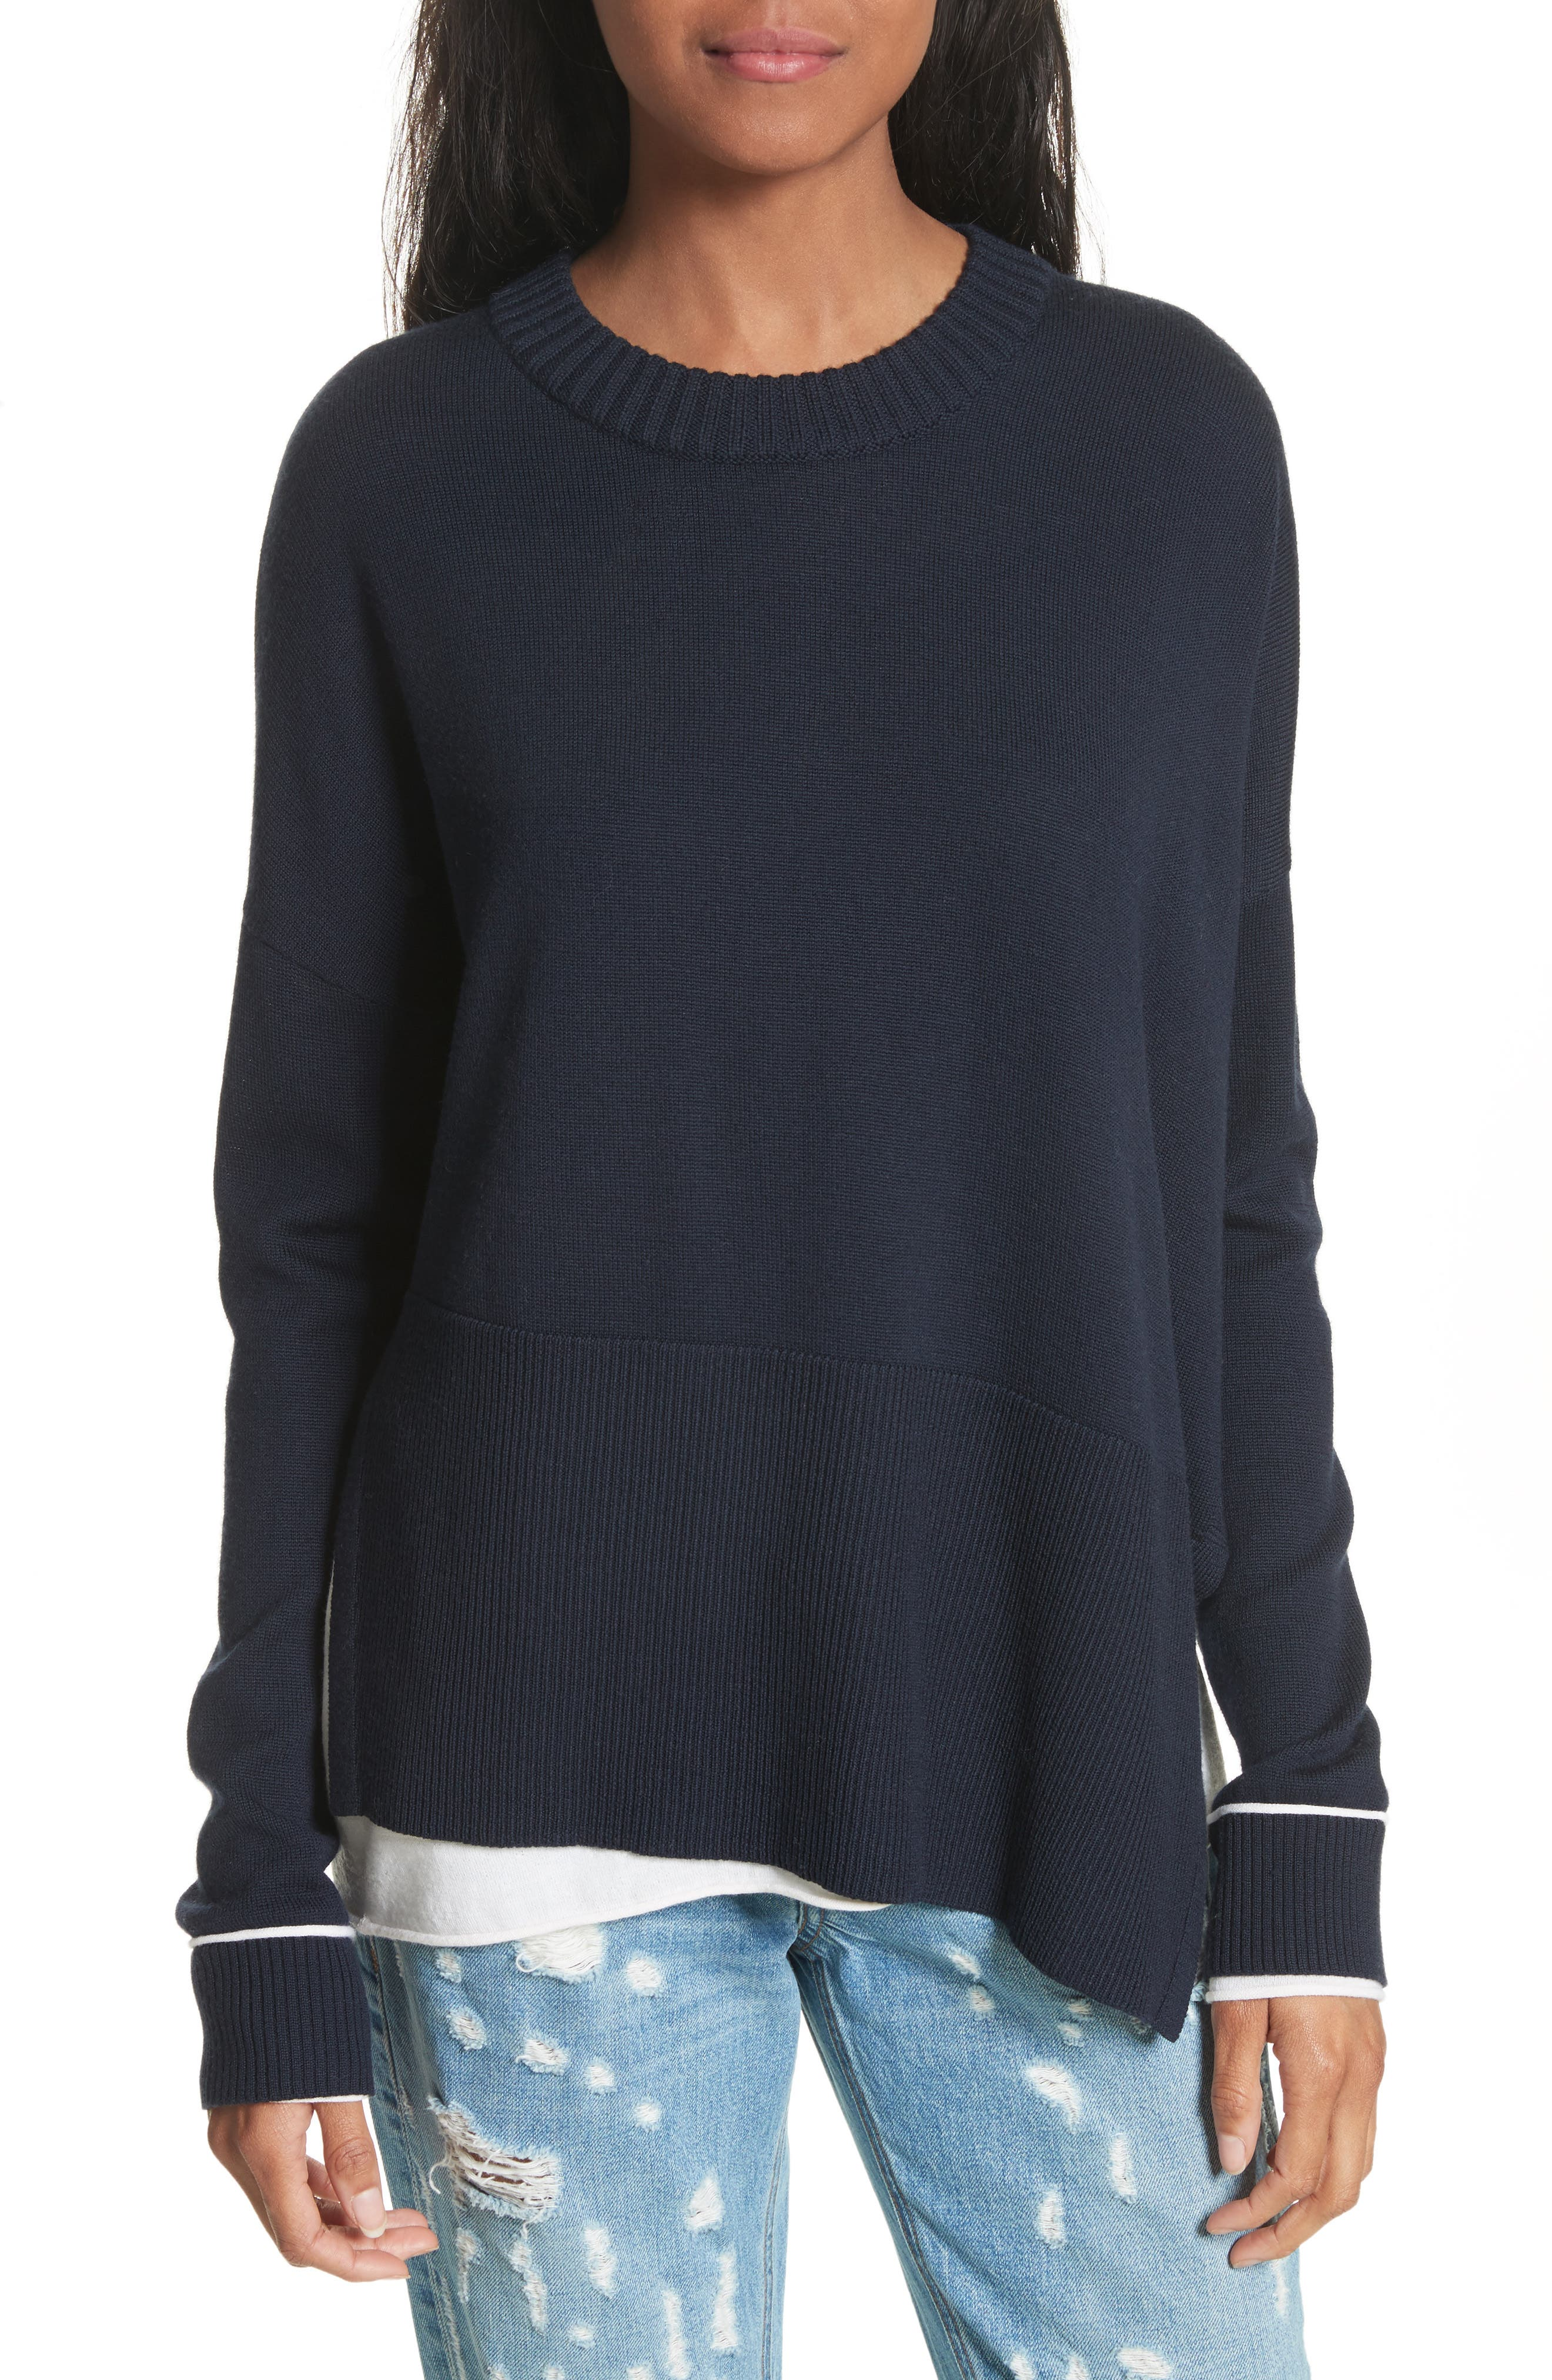 Derek Lam 10 Crosby Layered Hem Wool & Cotton Sweater